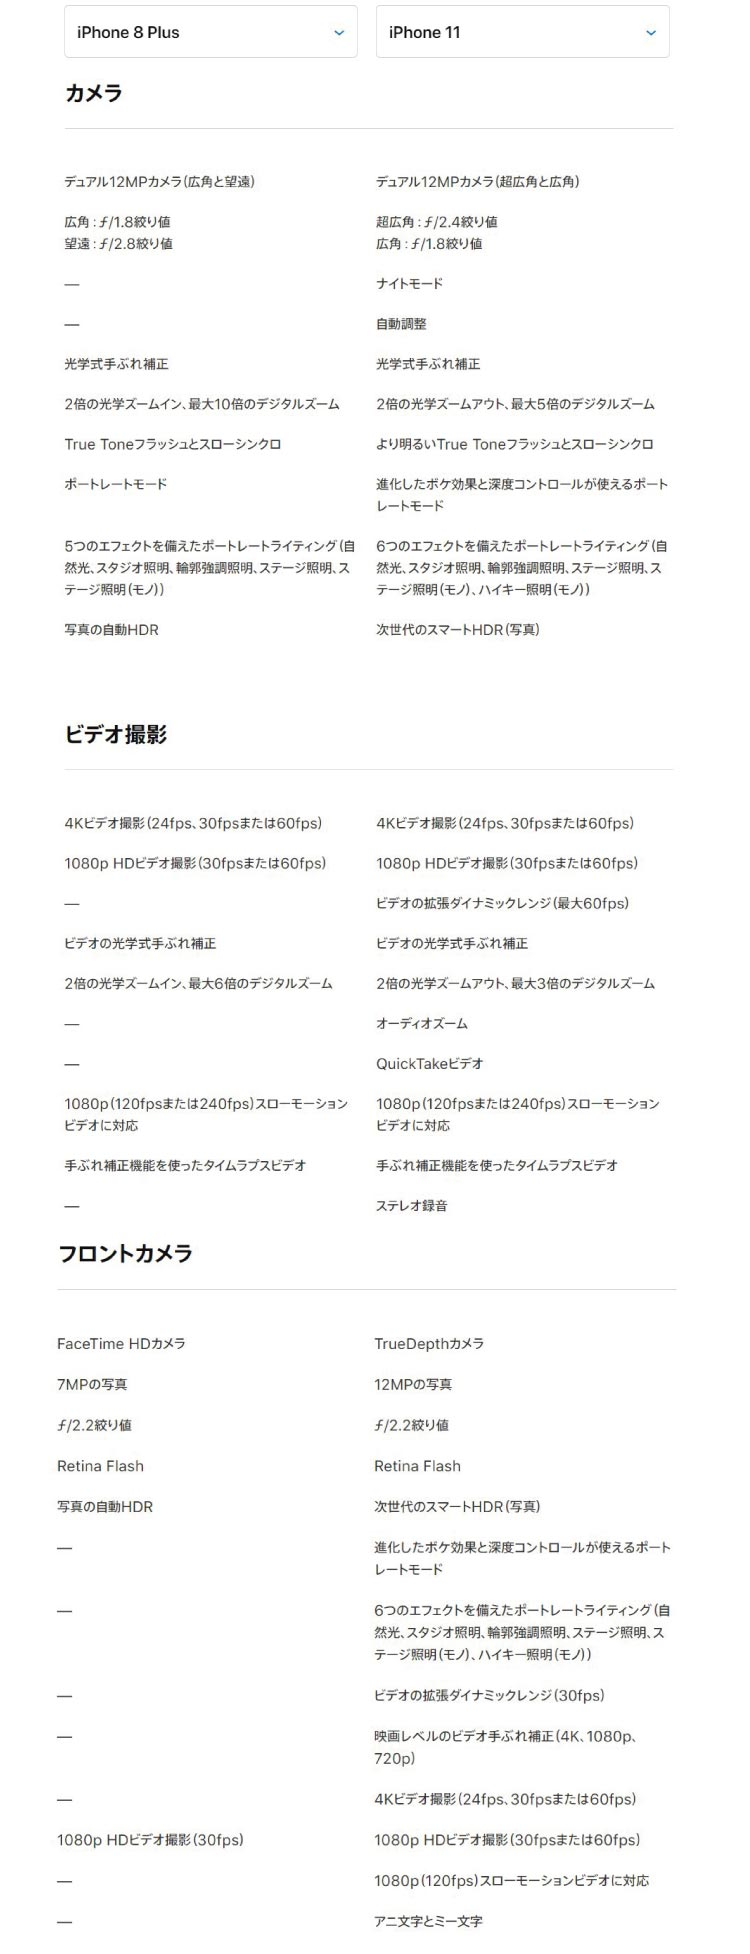 iPhone8plus vs iphone11 カメラ比較表